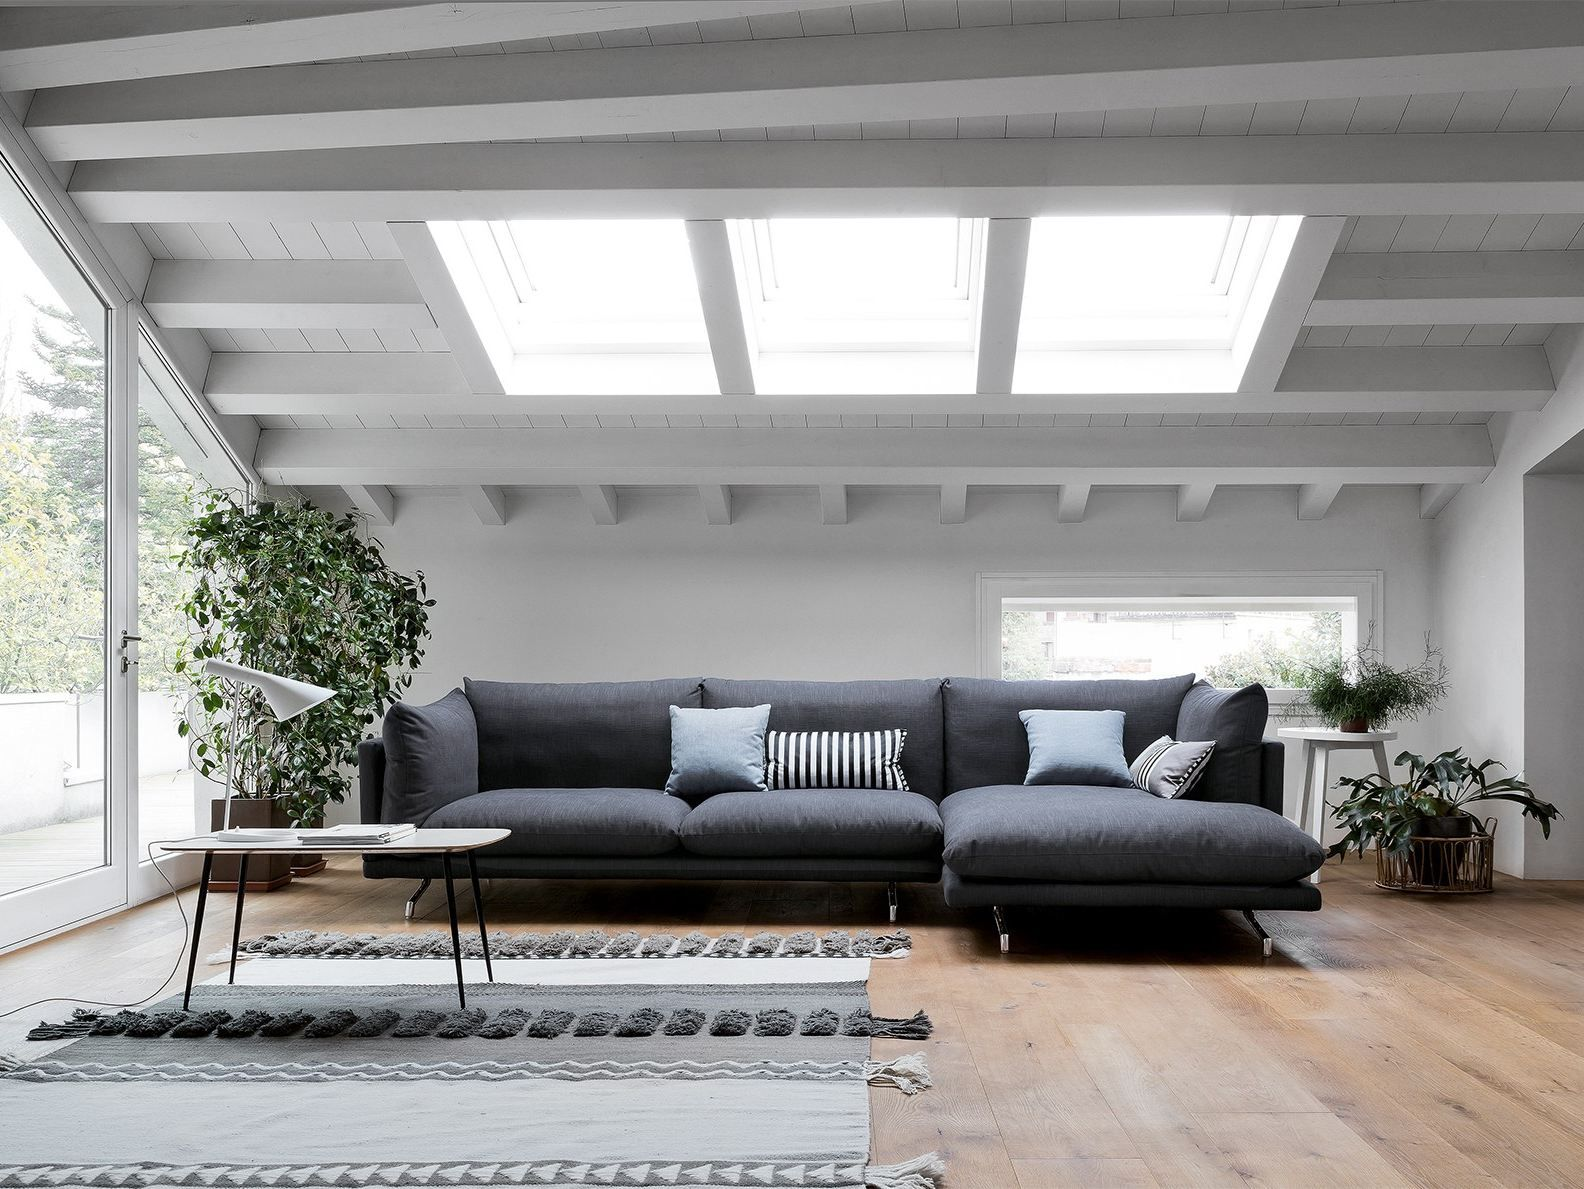 Fabric Sofa With Chaise Longue Swing By Dall Agnese Design Massimo Rosa Sofa Fabric Sofa Furniture Design